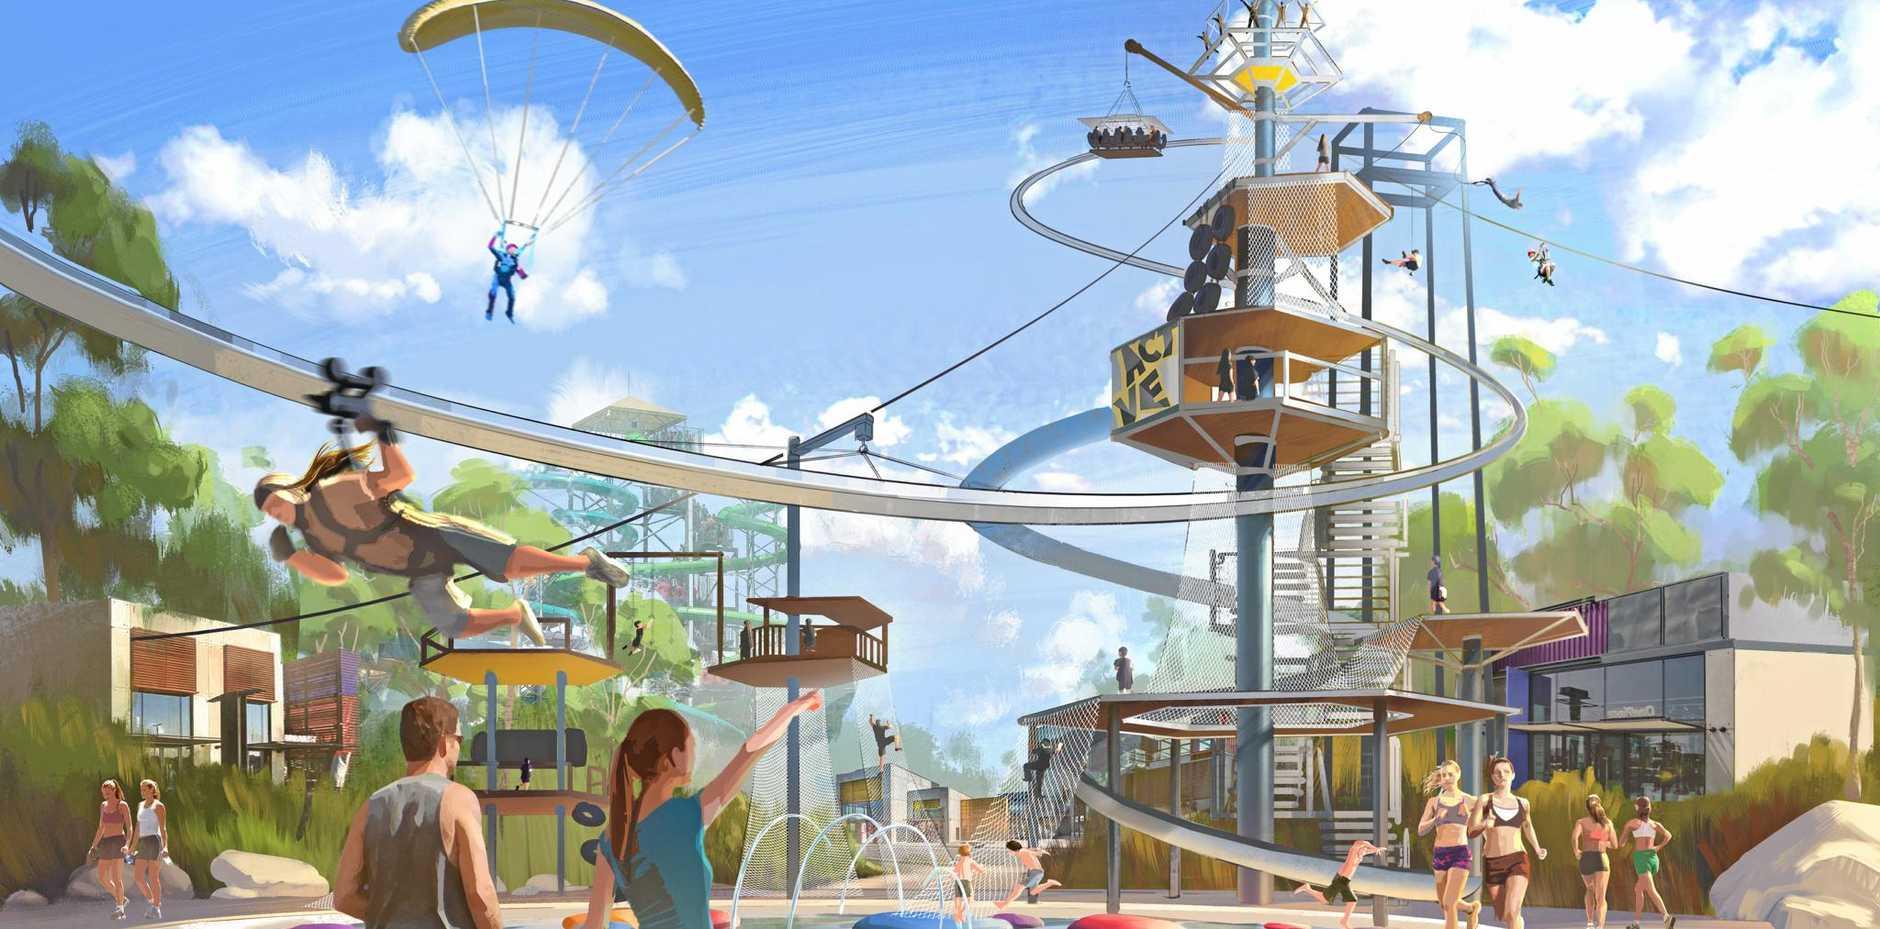 An artist's impression of the ACTVENTURE leisure park.